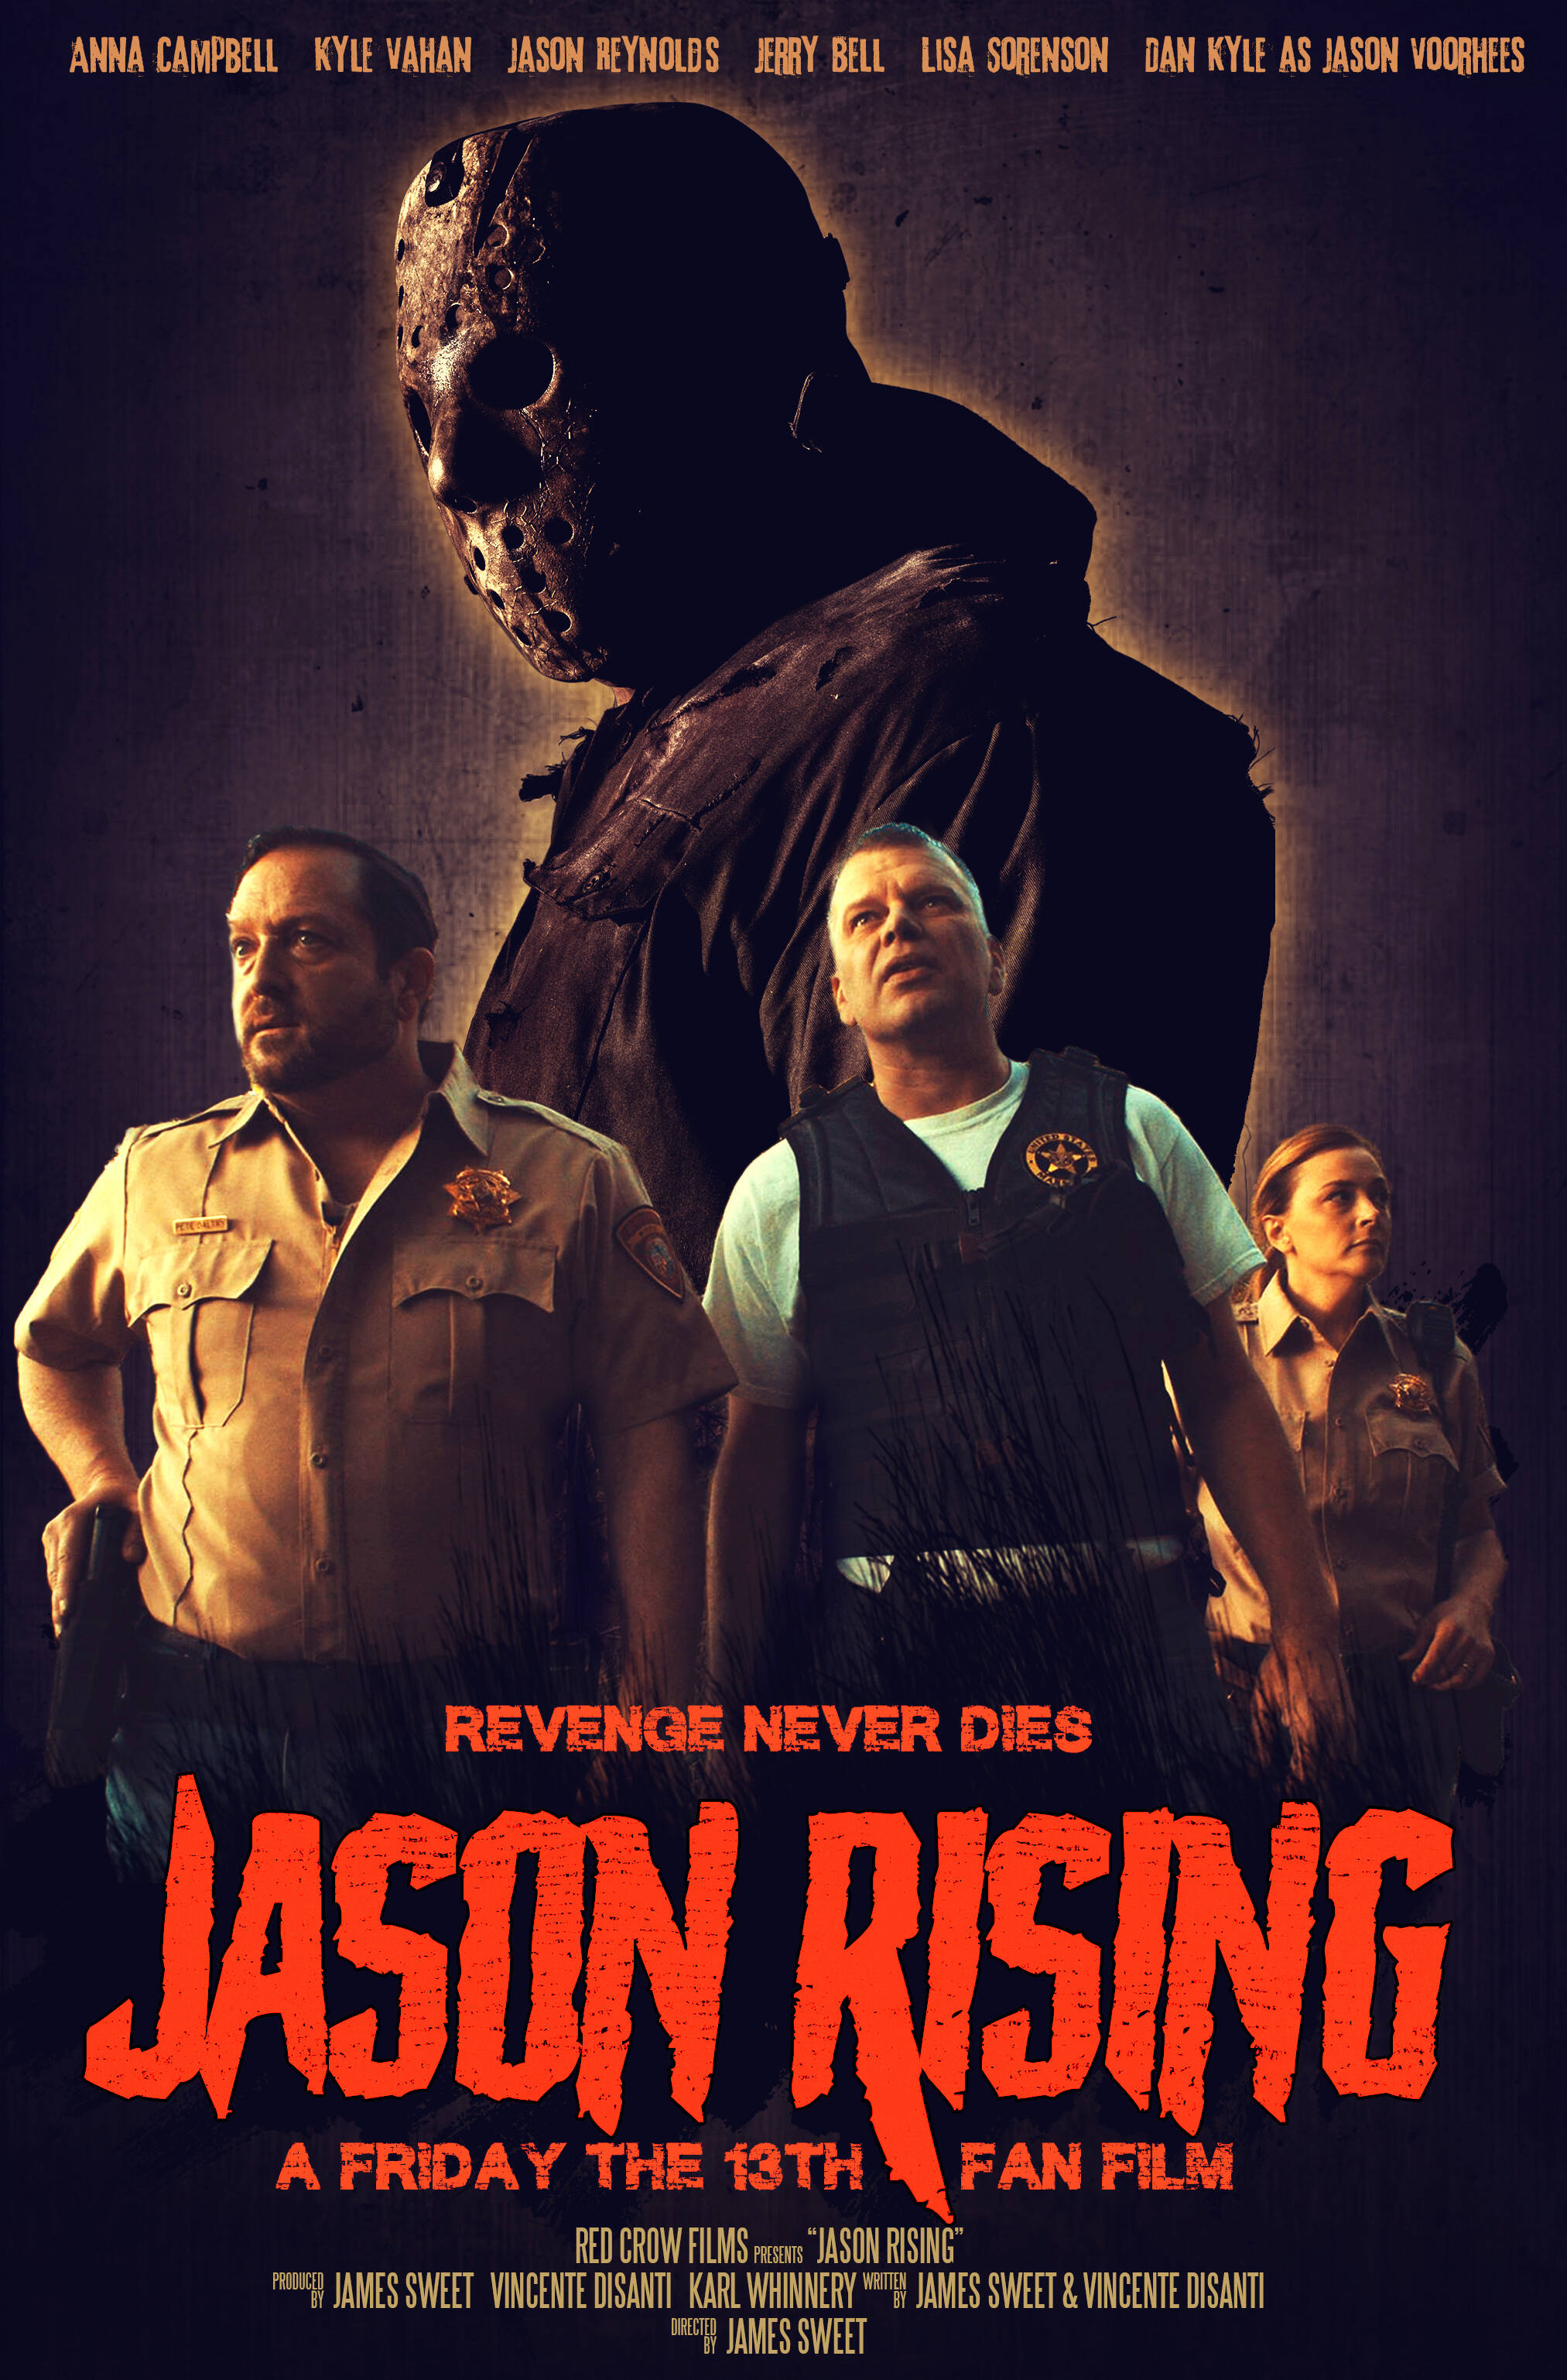 Jason Rising (Friday the 13th Fan Film) Mv5bnm10